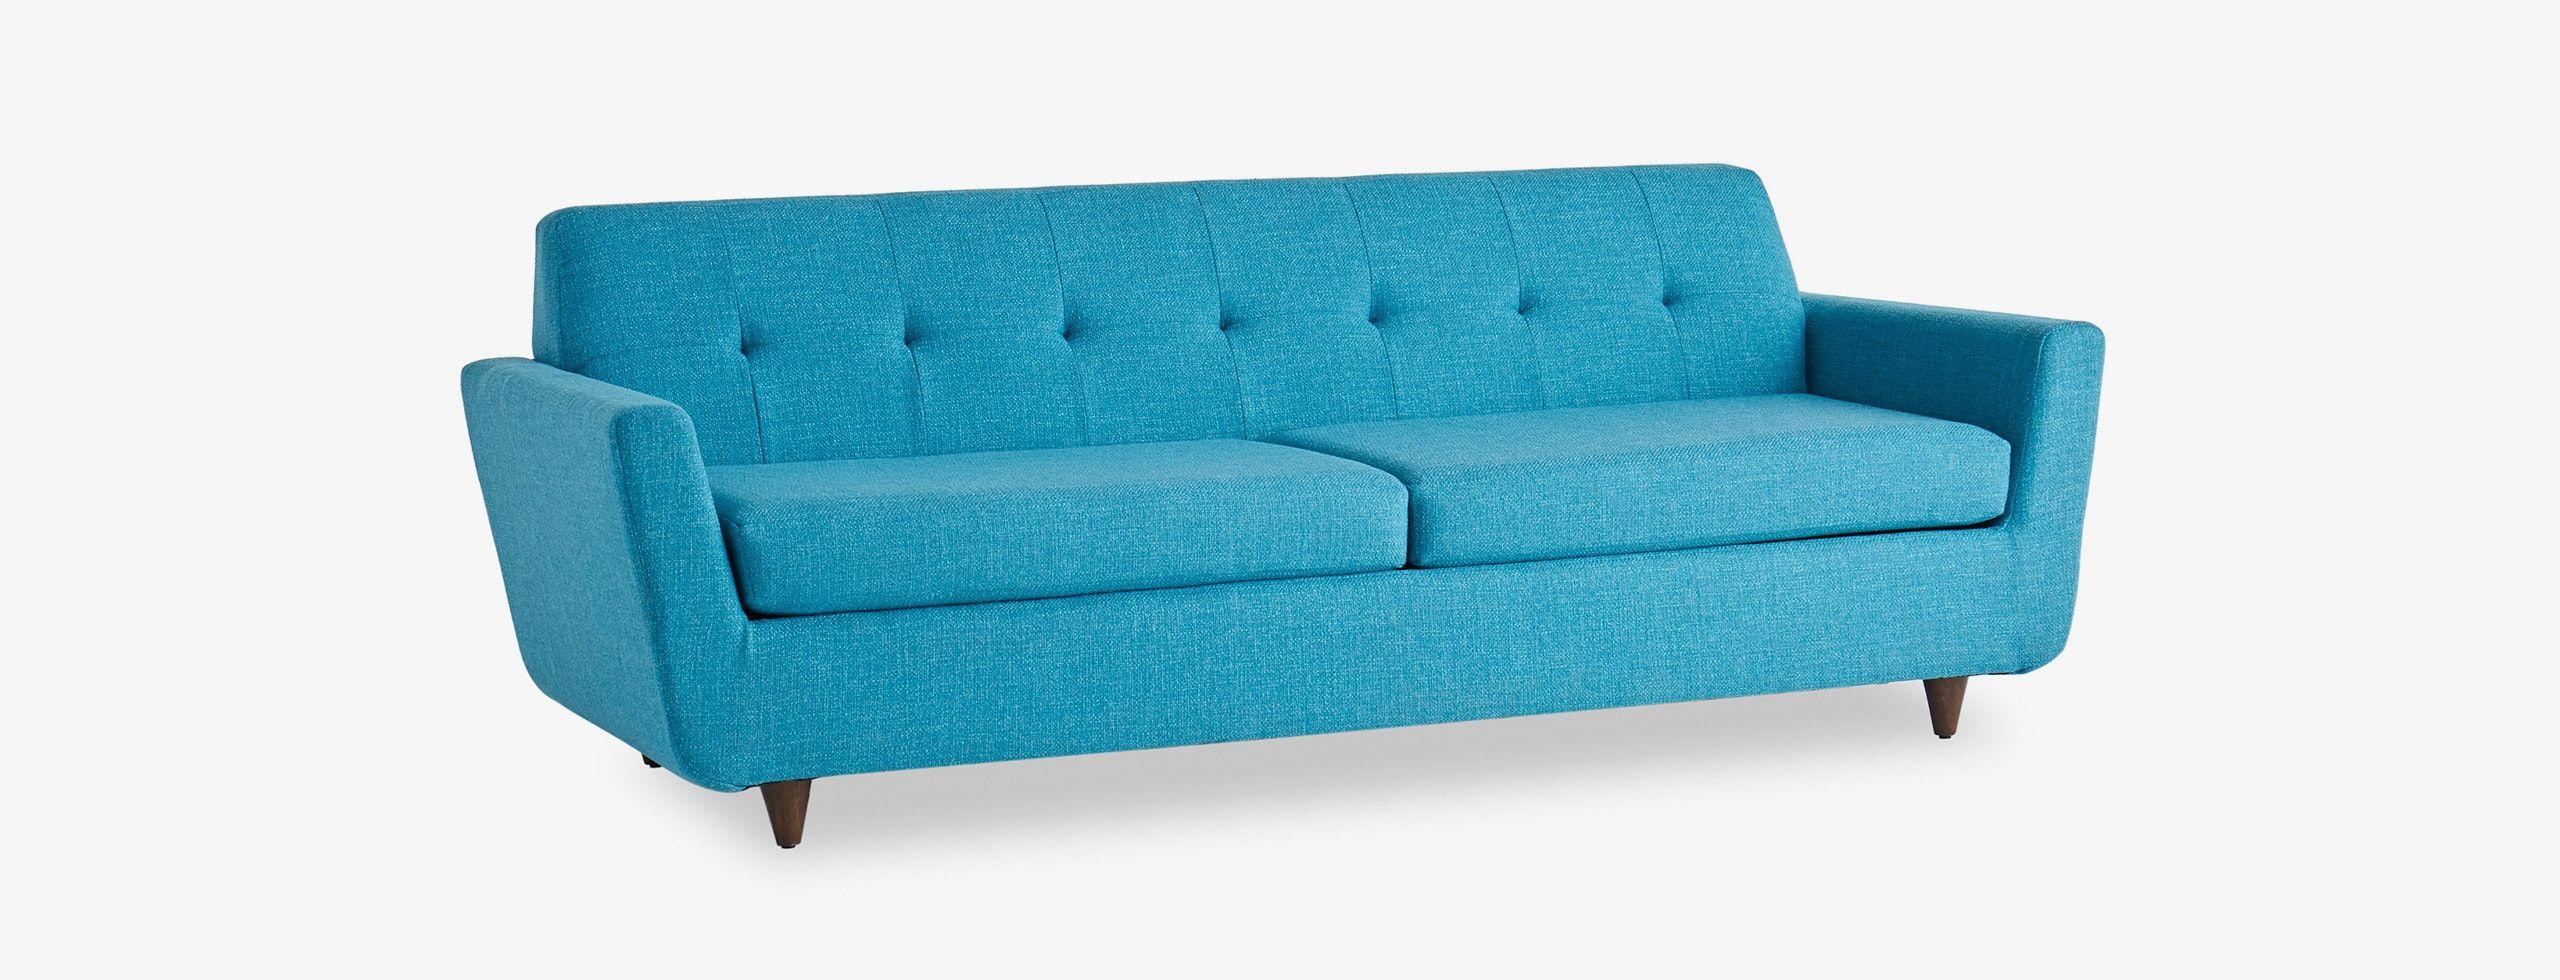 new style f998b c58d4 Hughes Sleeper Sofa in 2019   HOME 2019   Sofa, Sleeper sofa ...